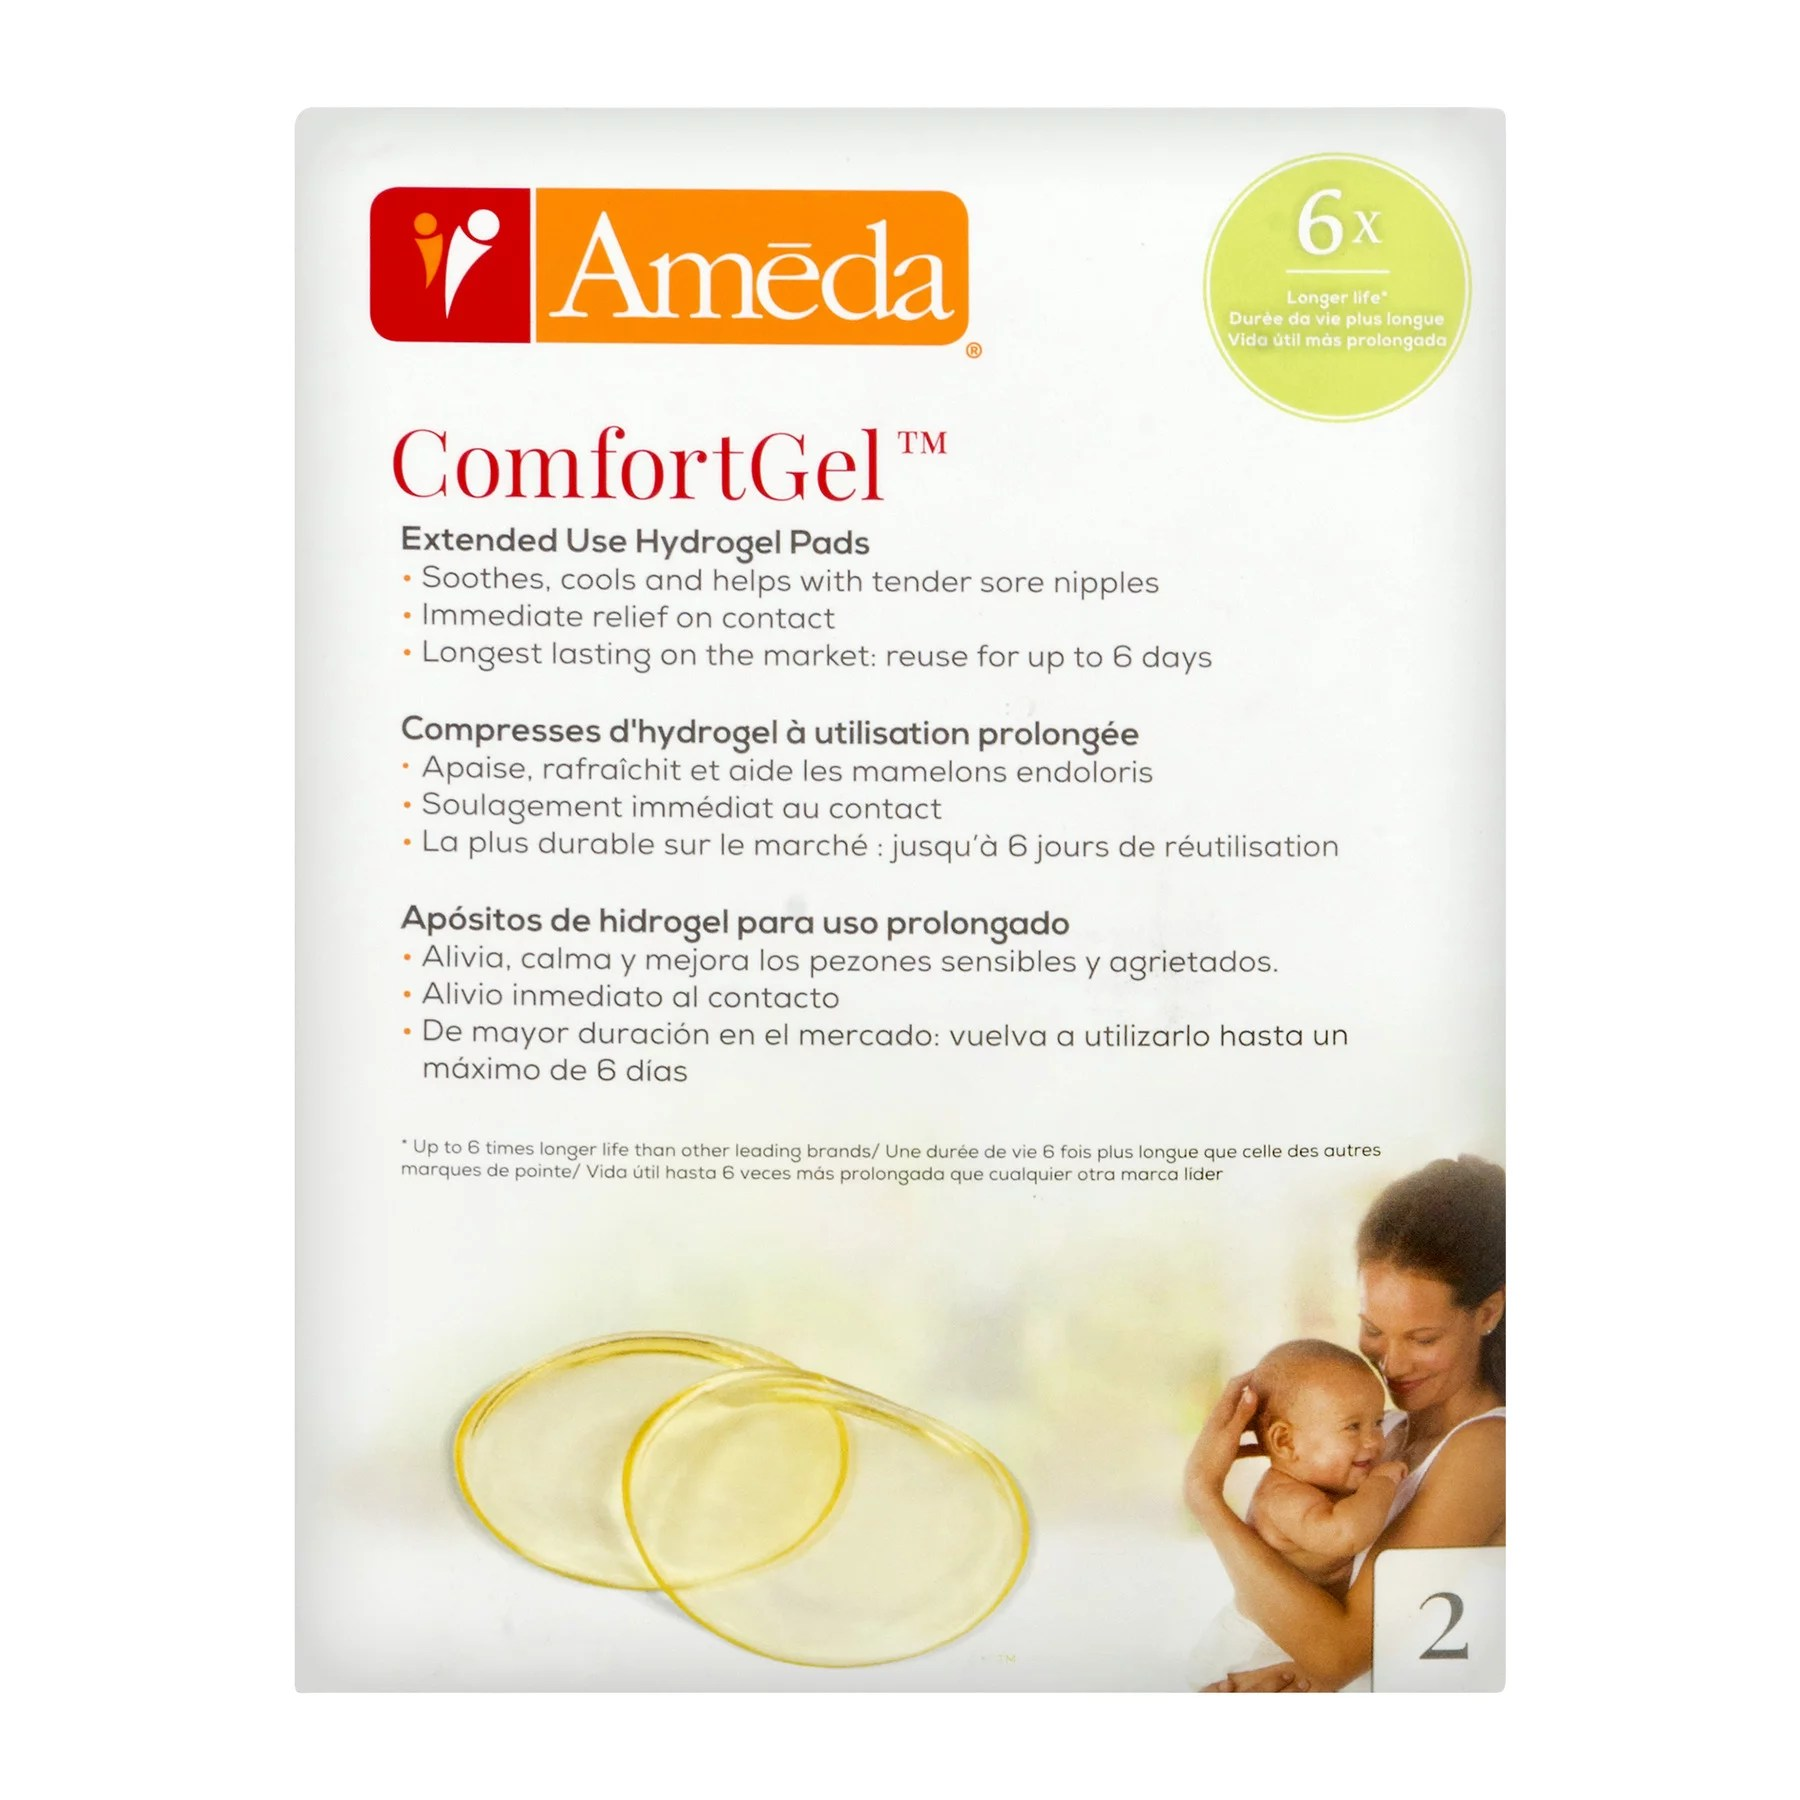 ameda comfortgel extended use hydrogel pads 2 pk 2 0 pack